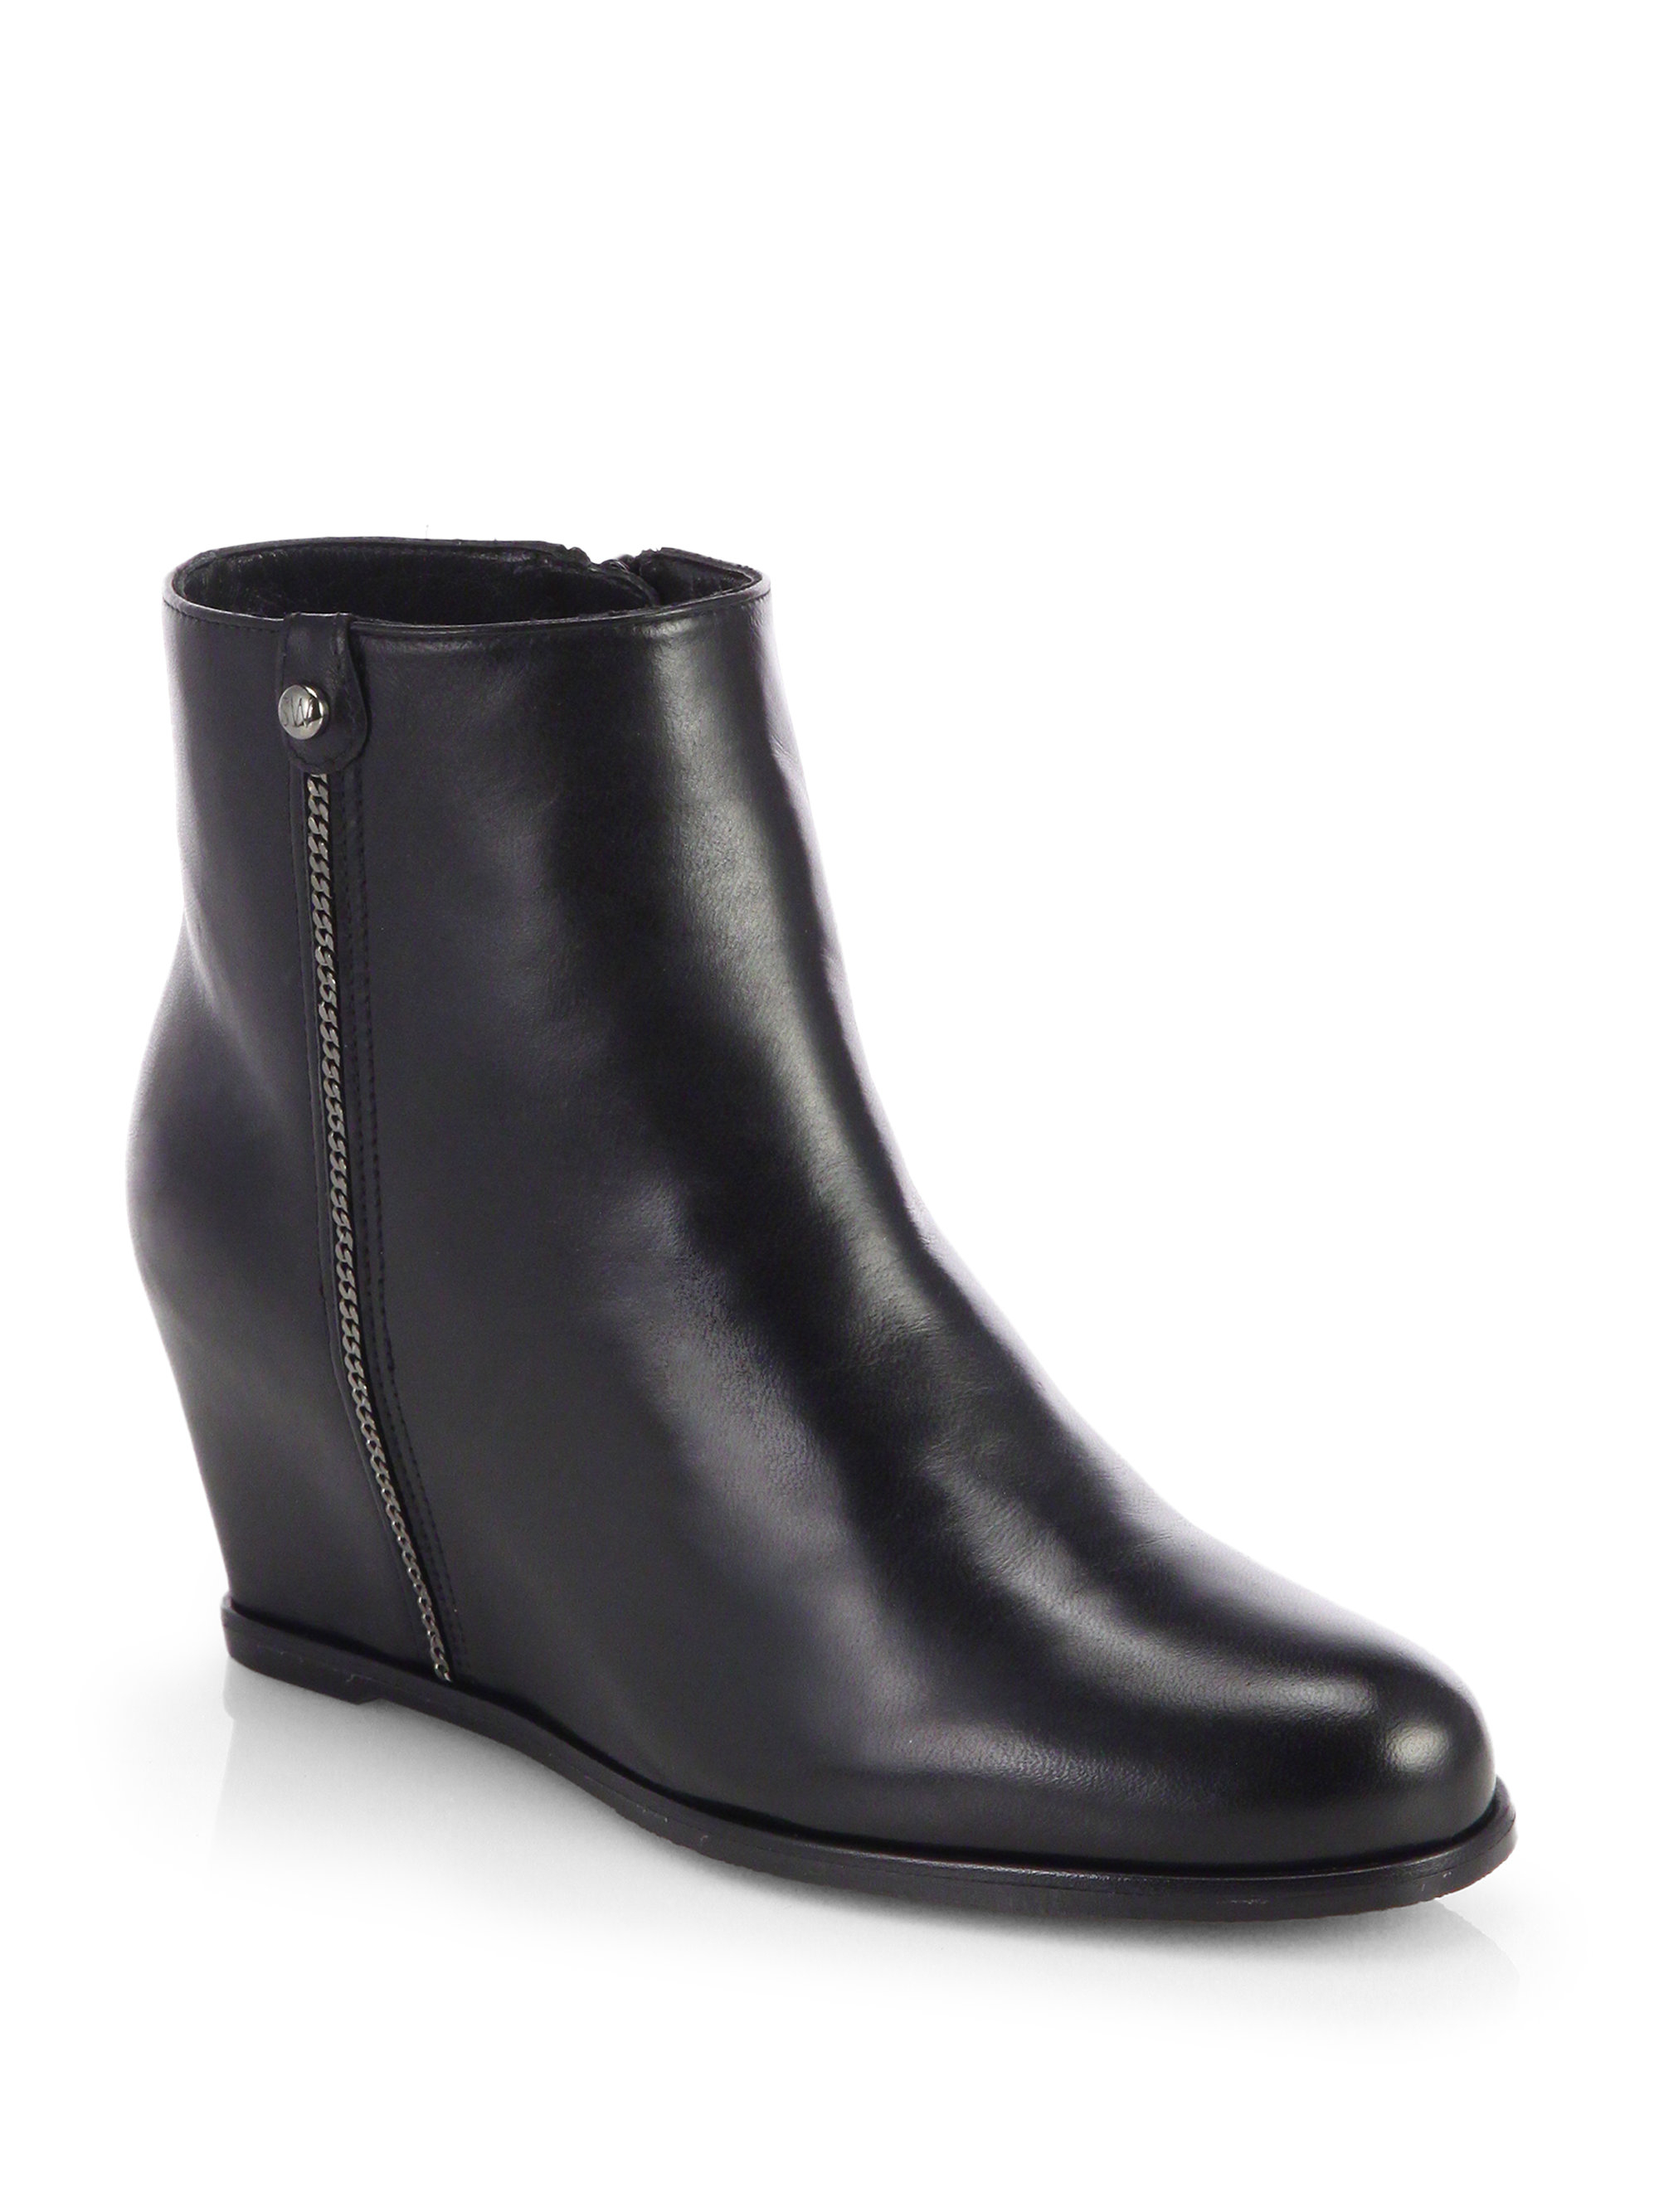 stuart weitzman sidetrack suede wedge ankle boots in black